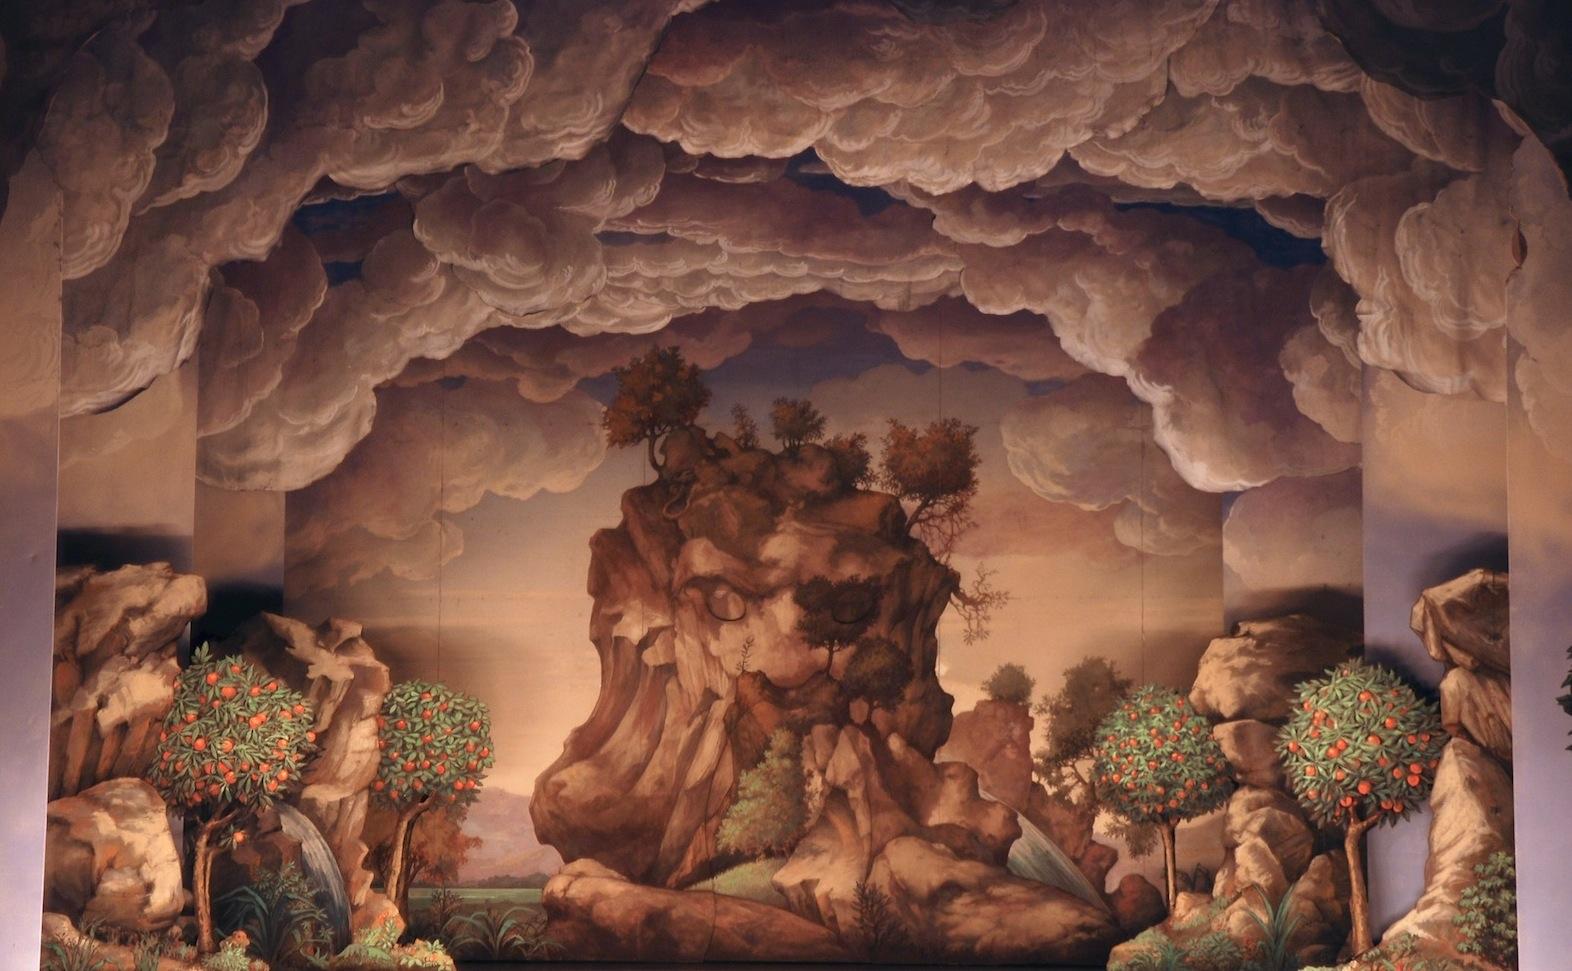 Toiles de decors de theatre gazille eric toiles peintes for Decor de theatre